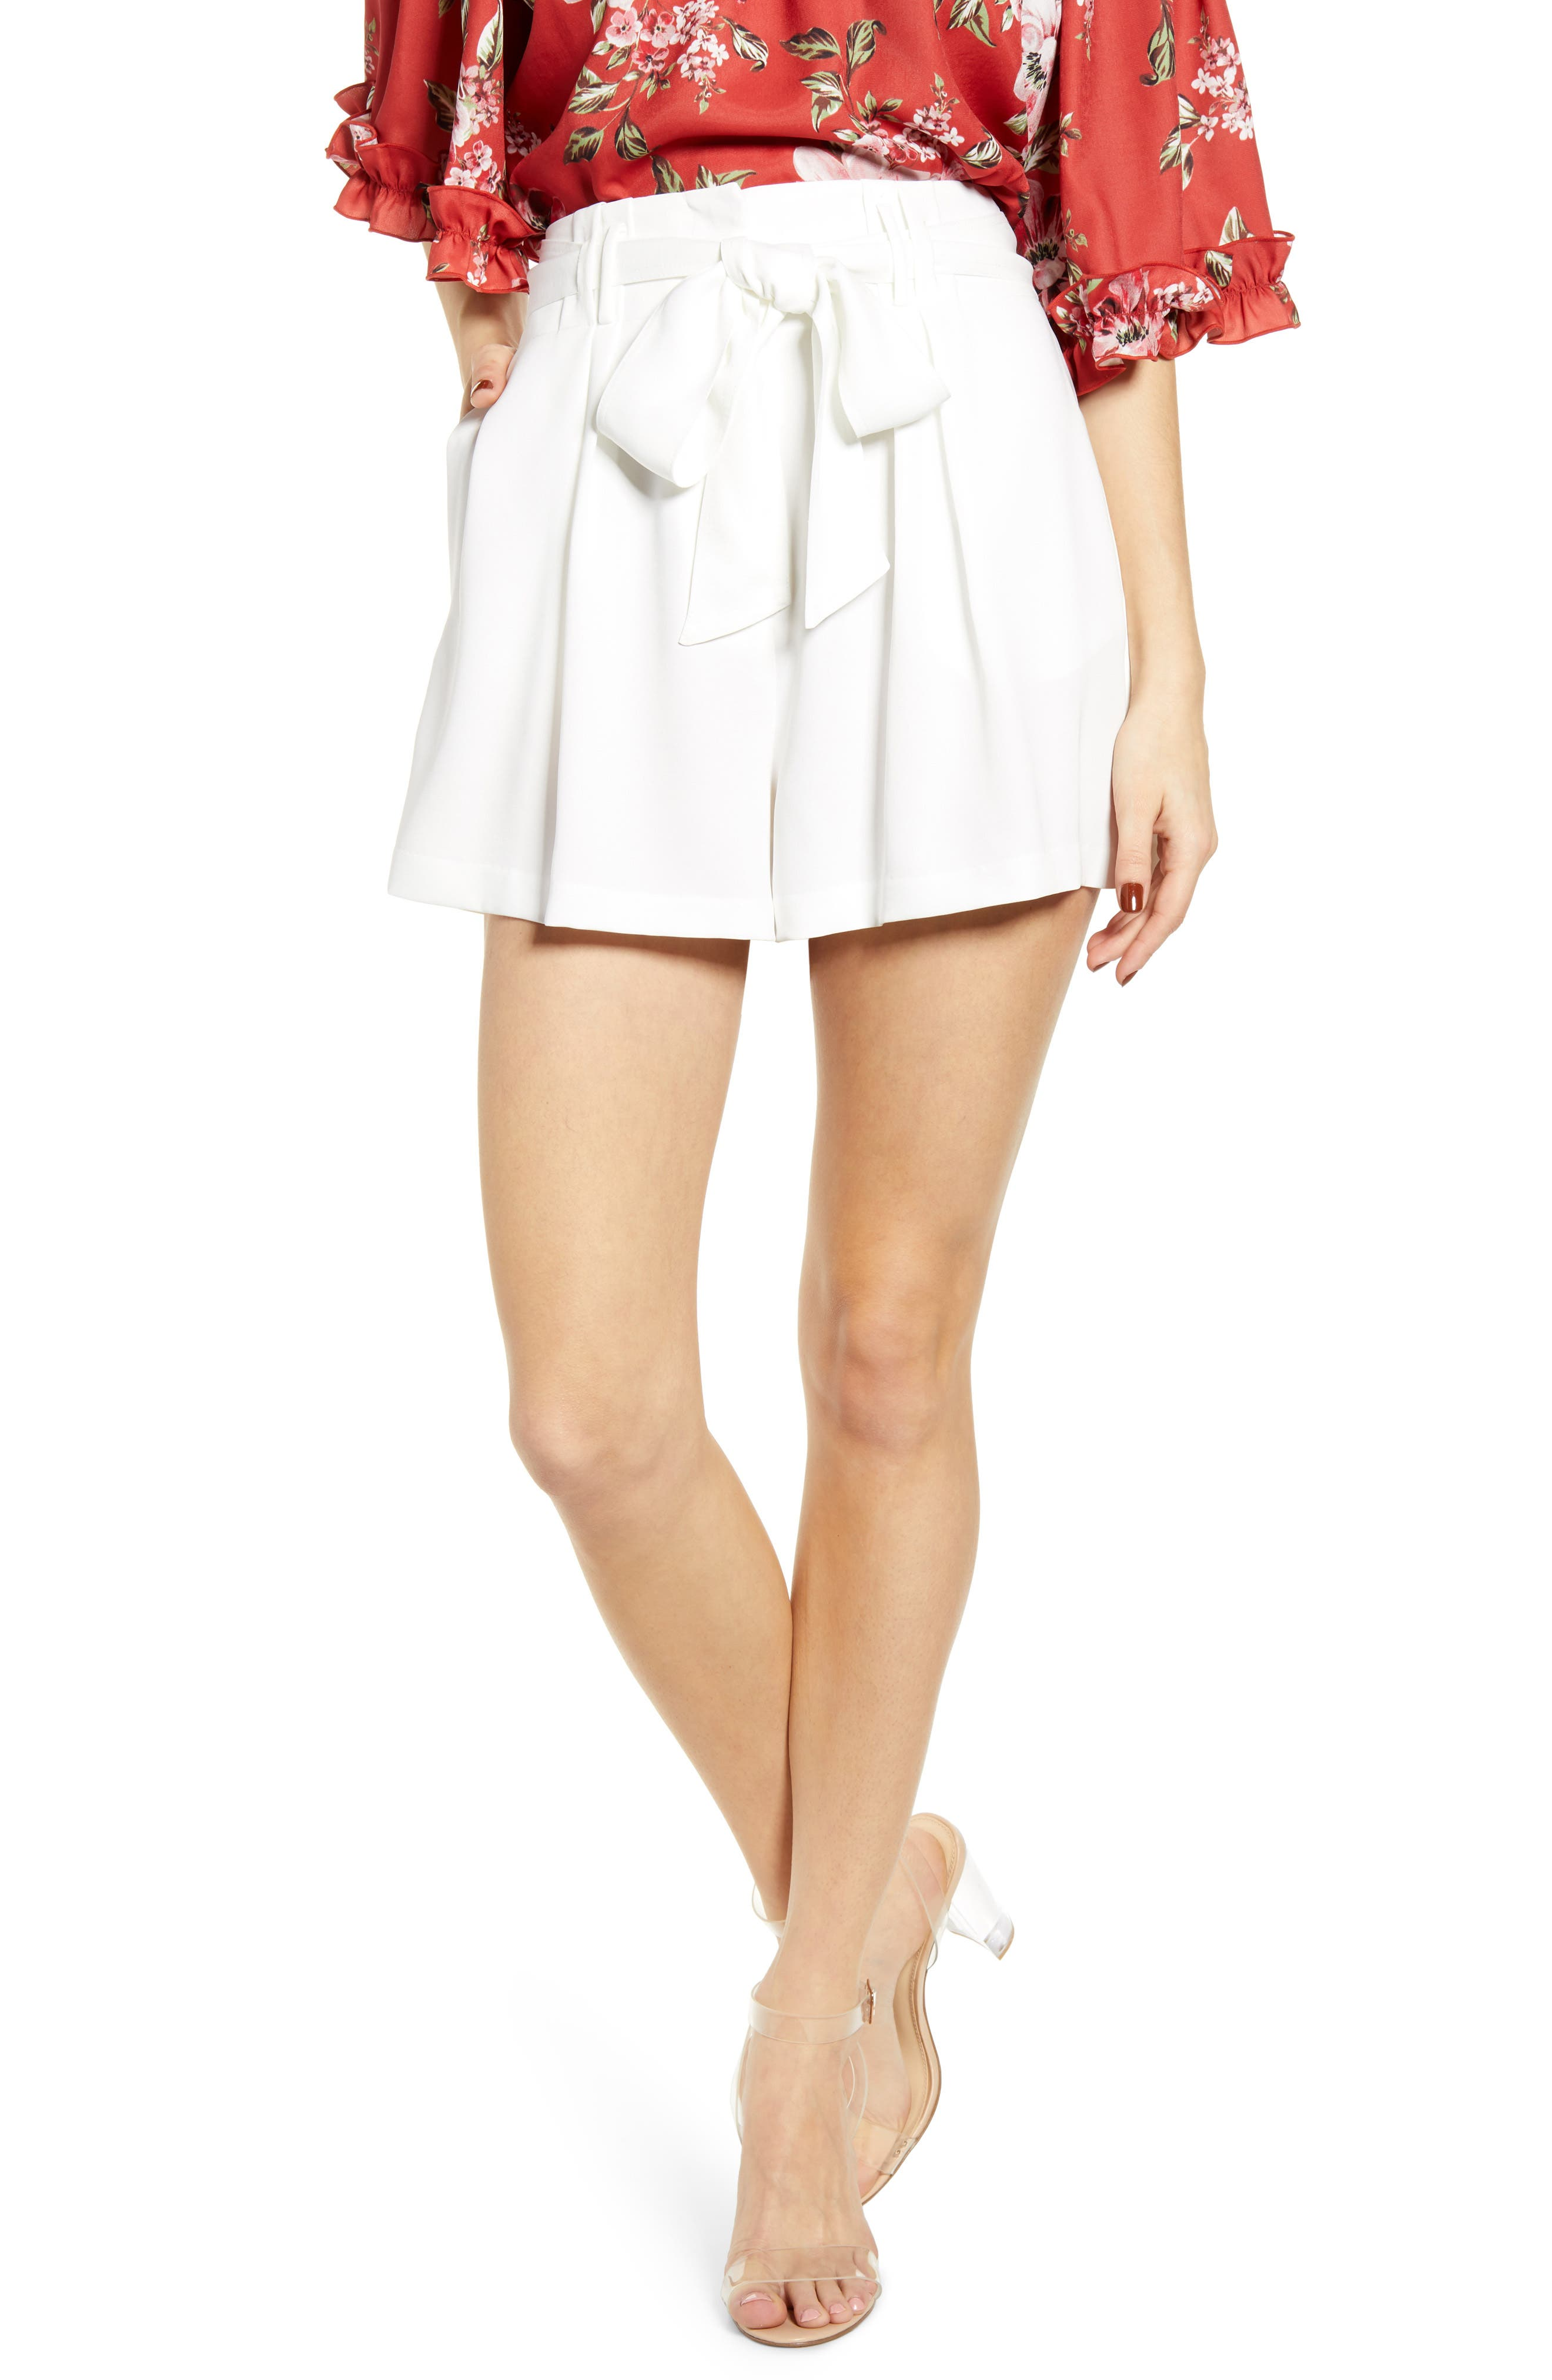 Vintage Shorts, Culottes,  Capris History Womens Wayf Pleated Tie Waist Shorts $79.00 AT vintagedancer.com